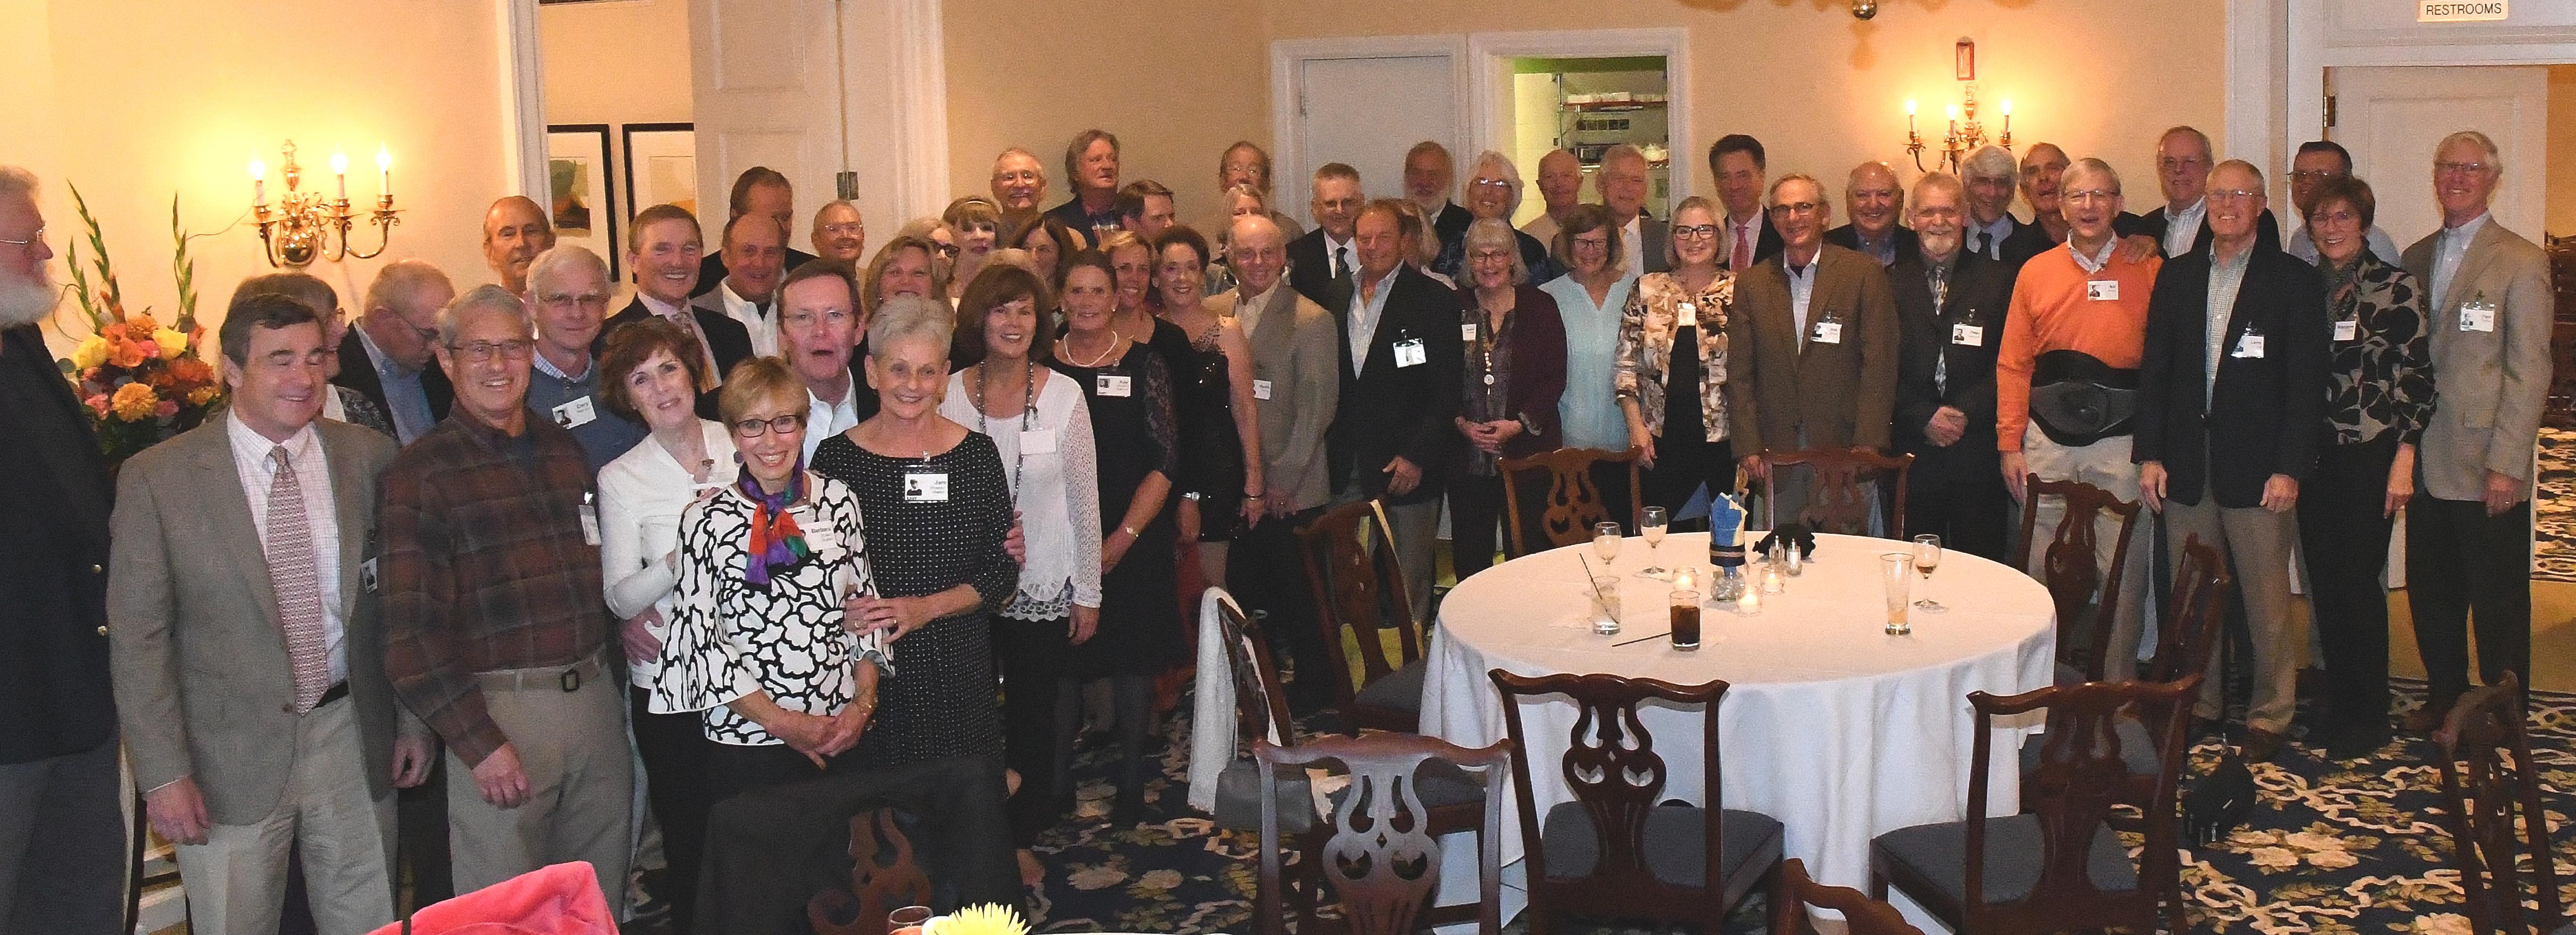 Class of 1967 50th reunion